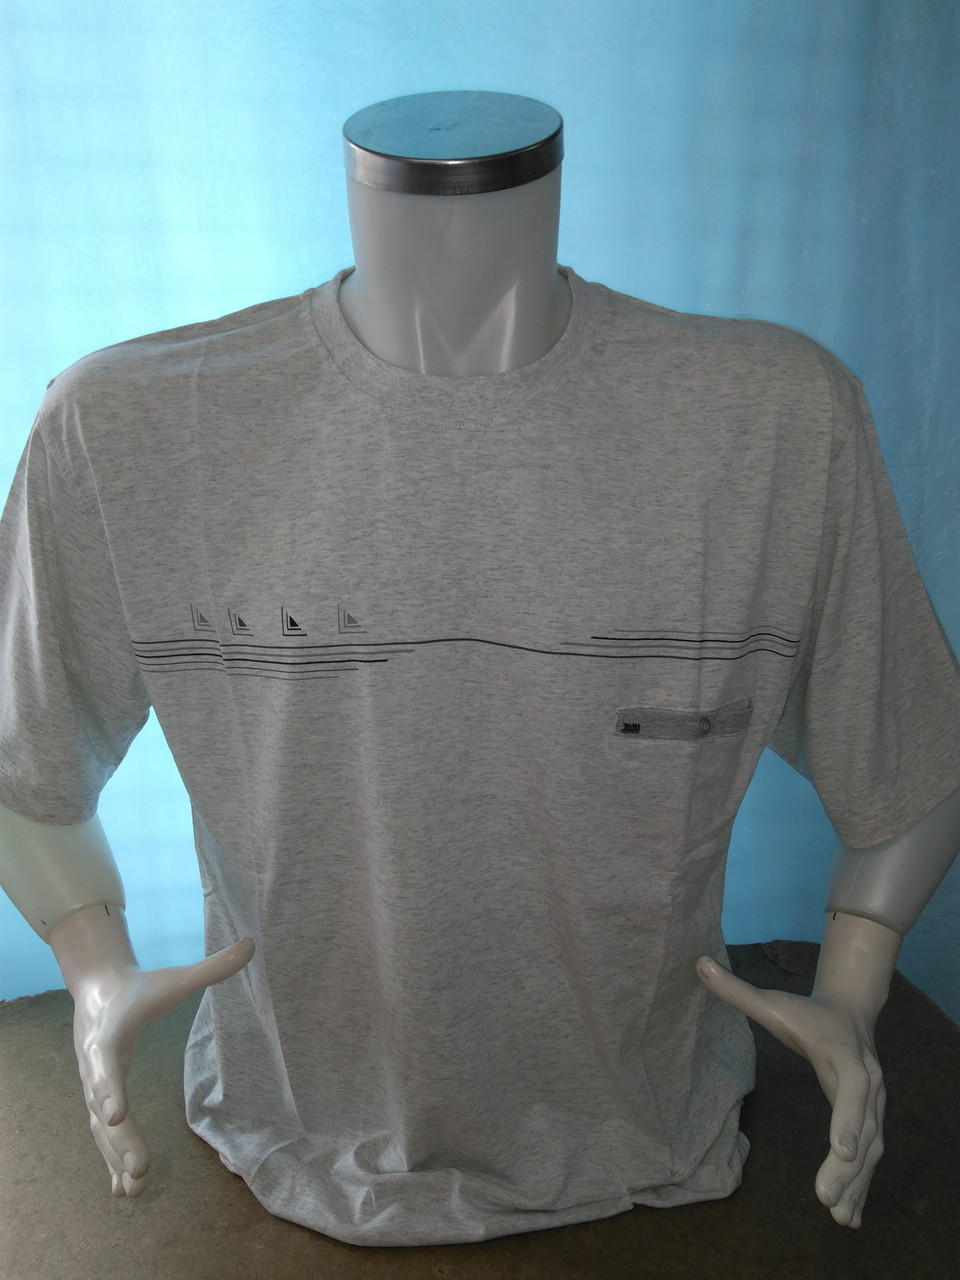 Мужская футболка (JUJO)   увеличенная